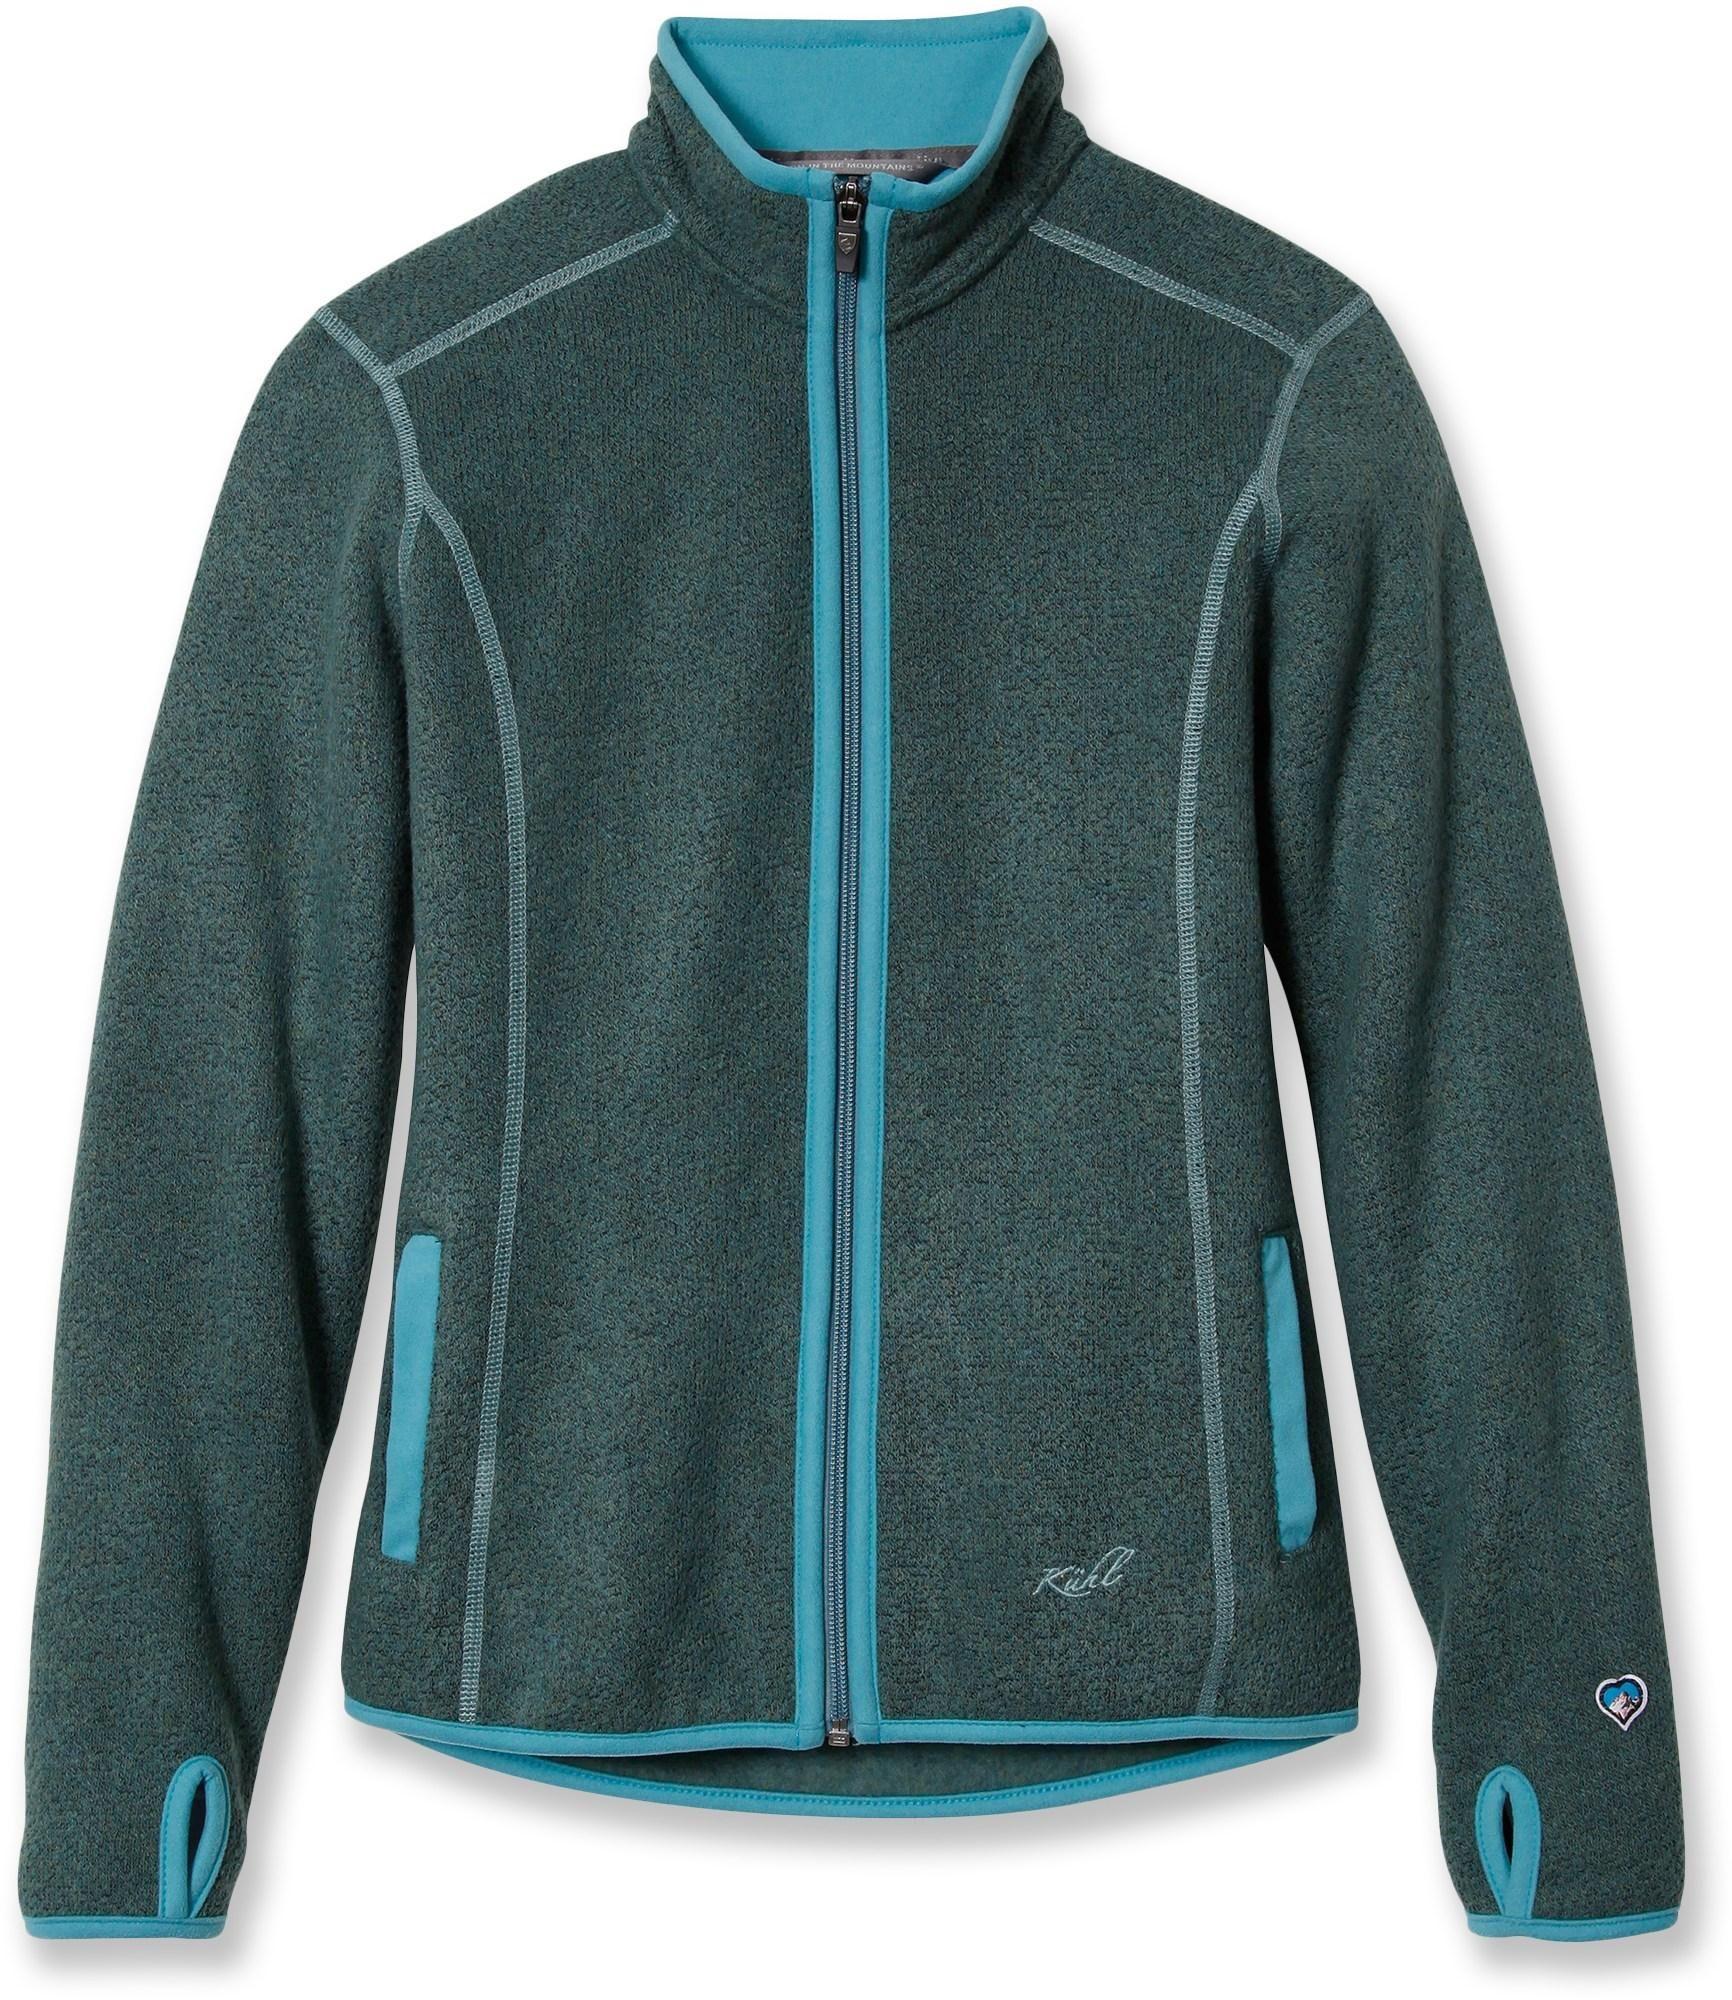 At rei outlet womenus kuhl tara fullzip sweater is a fleece jacket